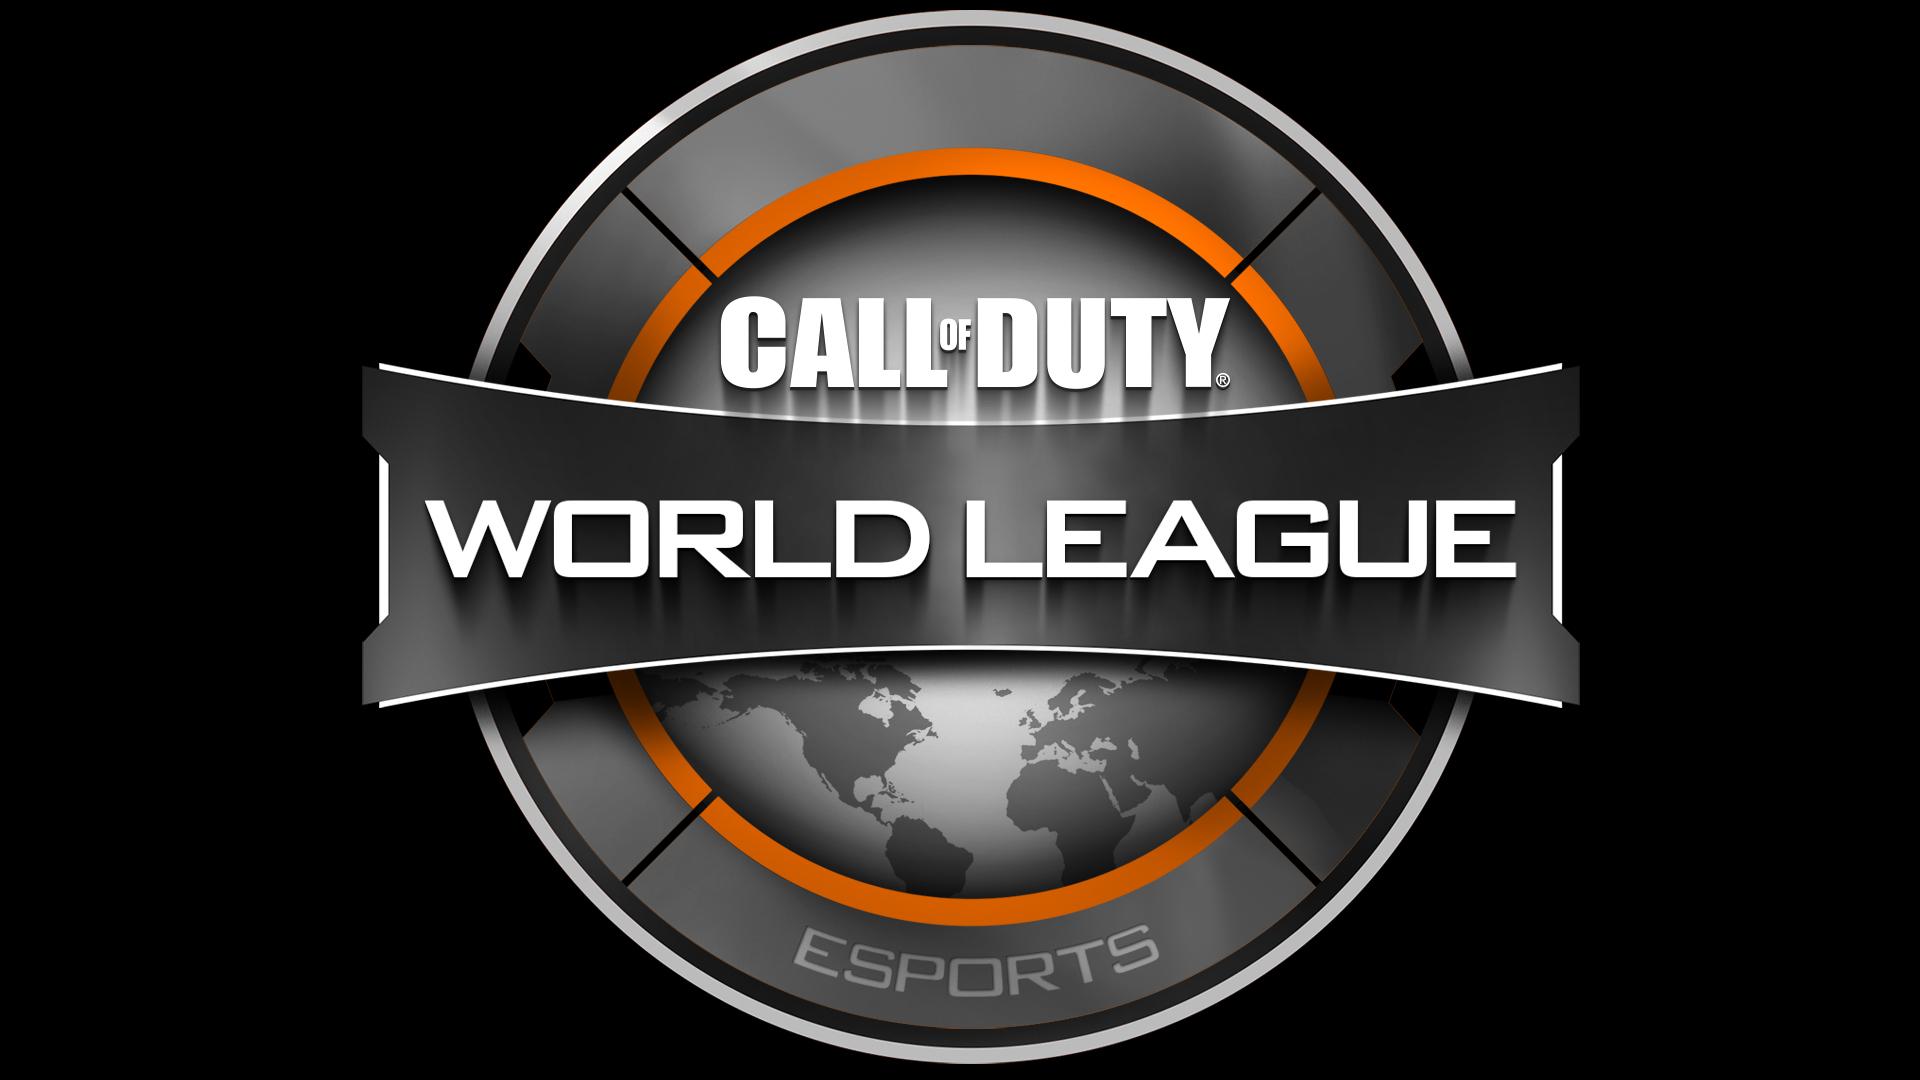 Call of Duty World League - Team OpTic Gaming gewinnt die Paris Open